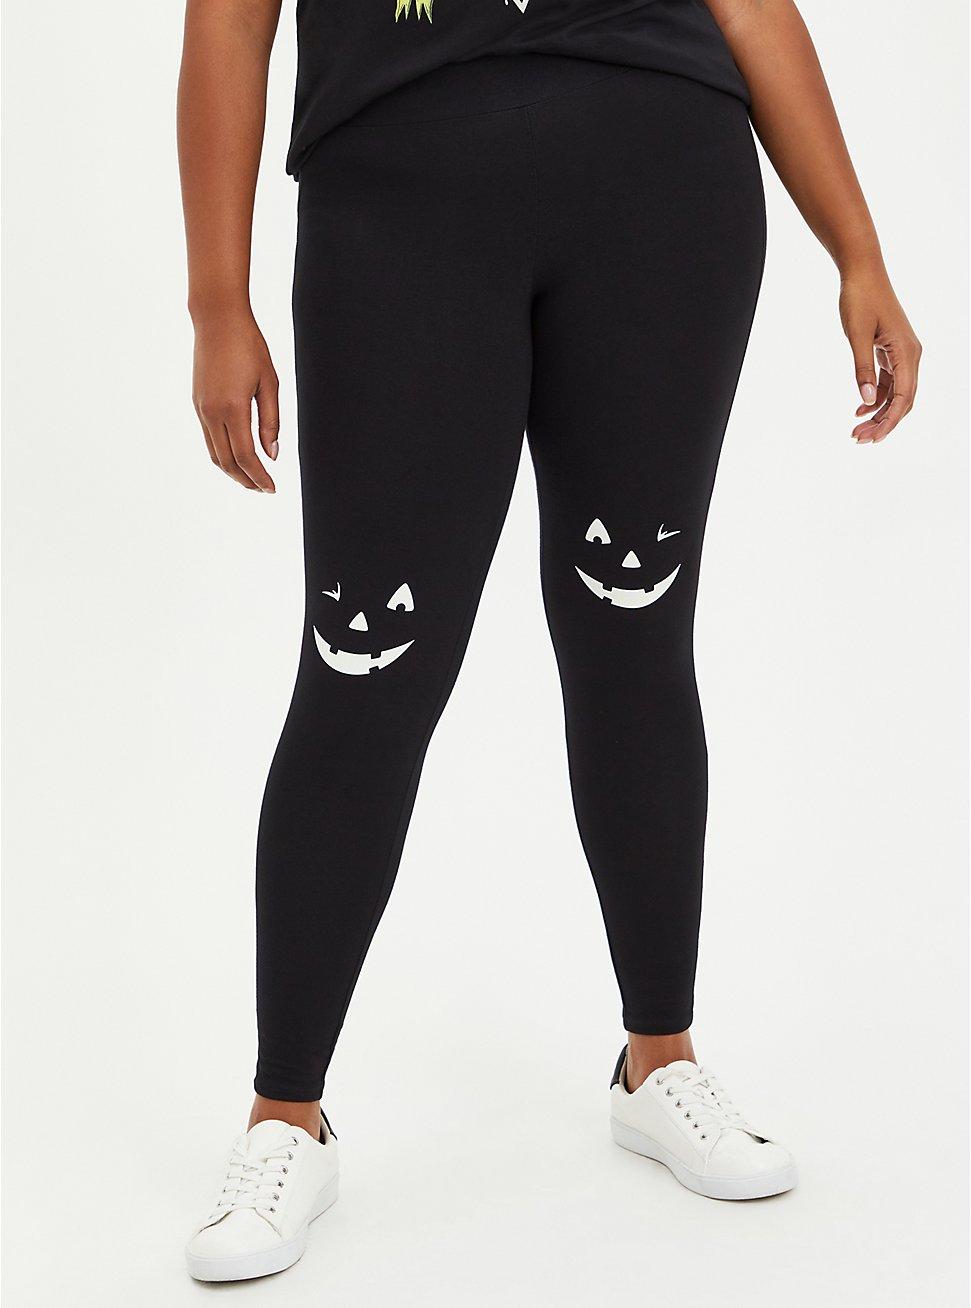 Premium Legging - Glow In The Dark Jack-O'-Lantern Black, BLACK, hi-res